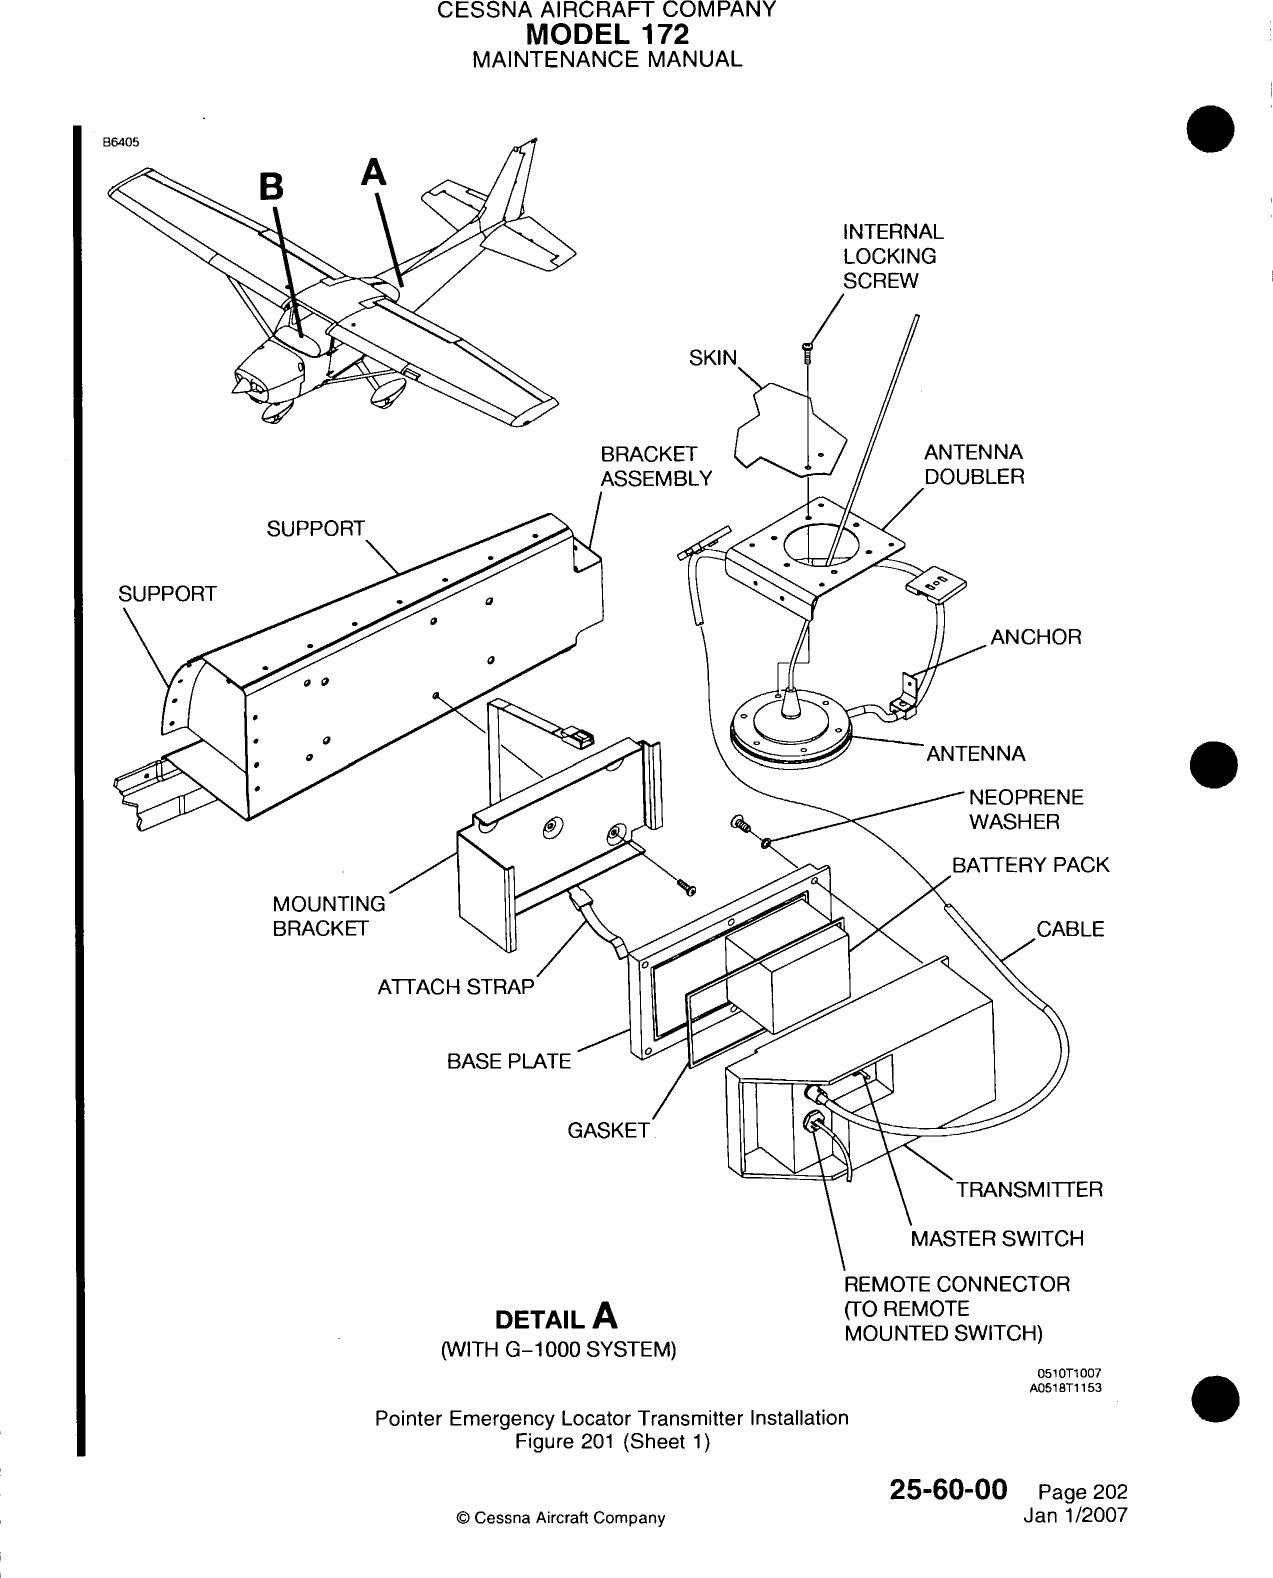 172RMM15 172 SERIES (1996 & ON) Cessna_172R_1996on_MM_C172RMM Cessna